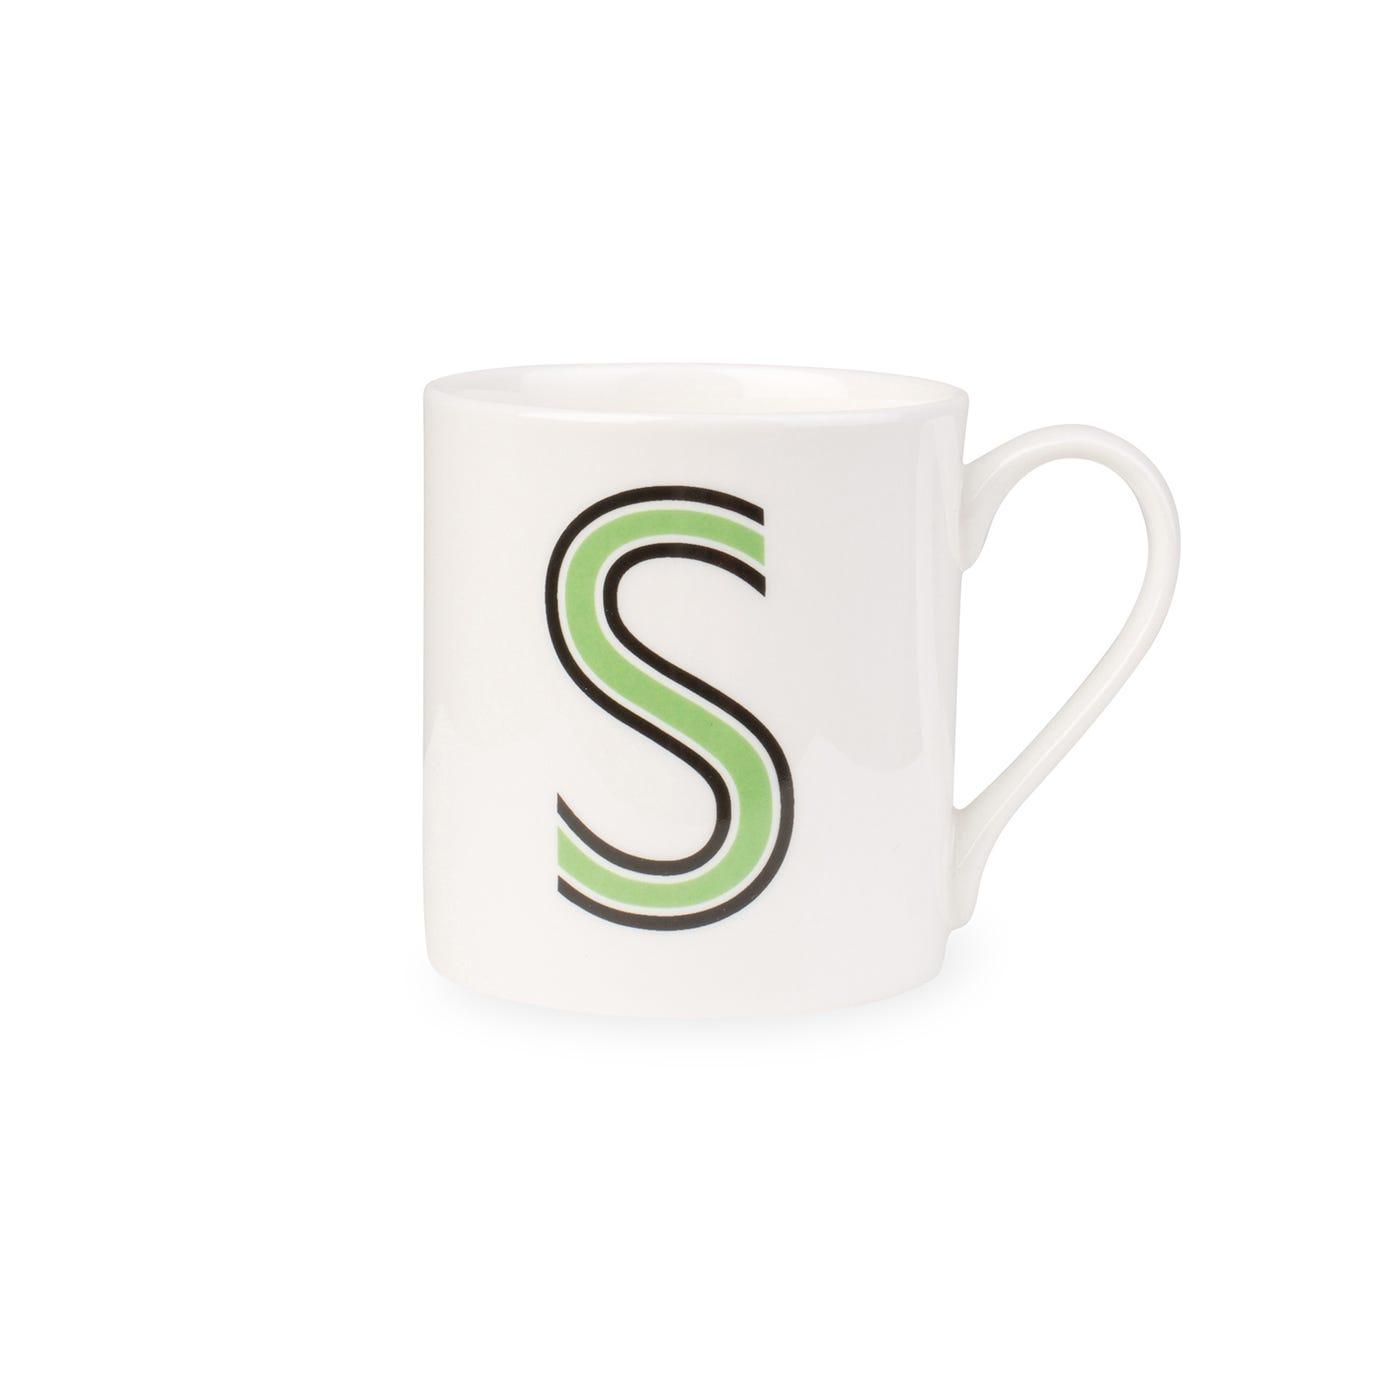 Heal's Heal's Heritage Alphabet Mug S